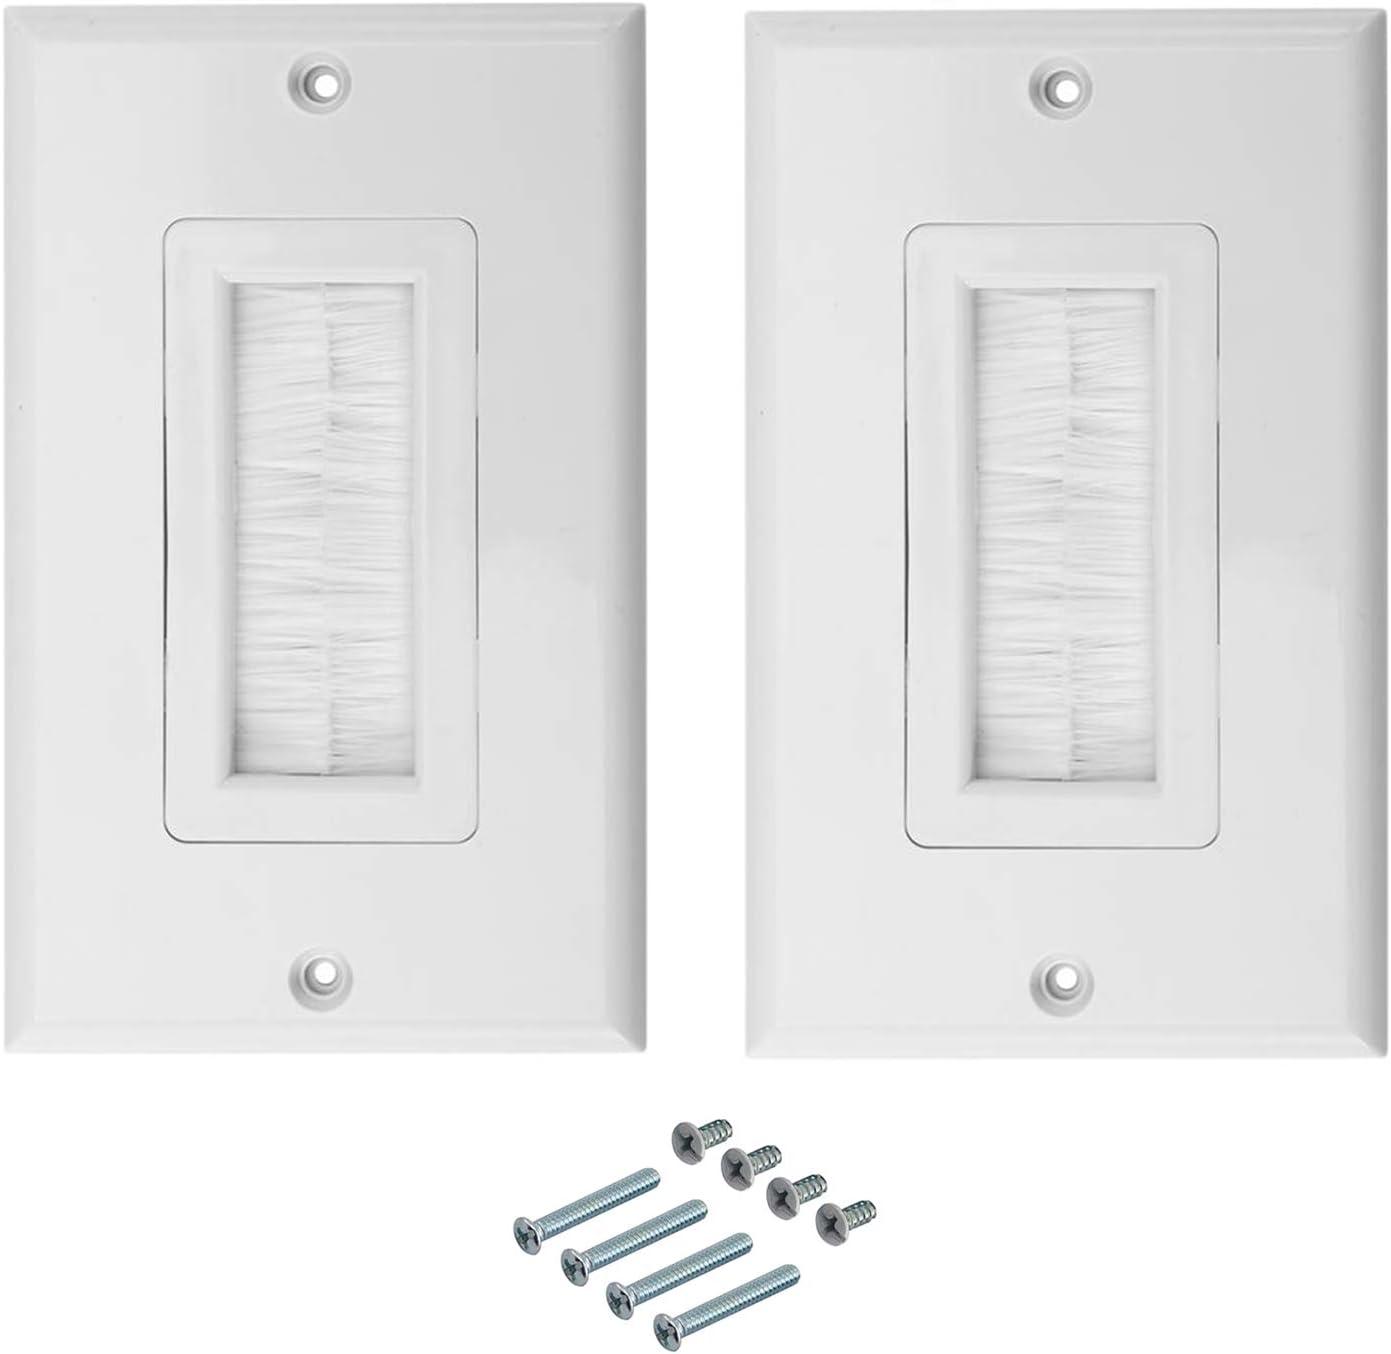 RLECS 1-Pack White Brush Wall Plate Single Port Multipurpose Outlet Cover Wall Mount Panel for Multimedia HDMI HDTV Speaker Wires